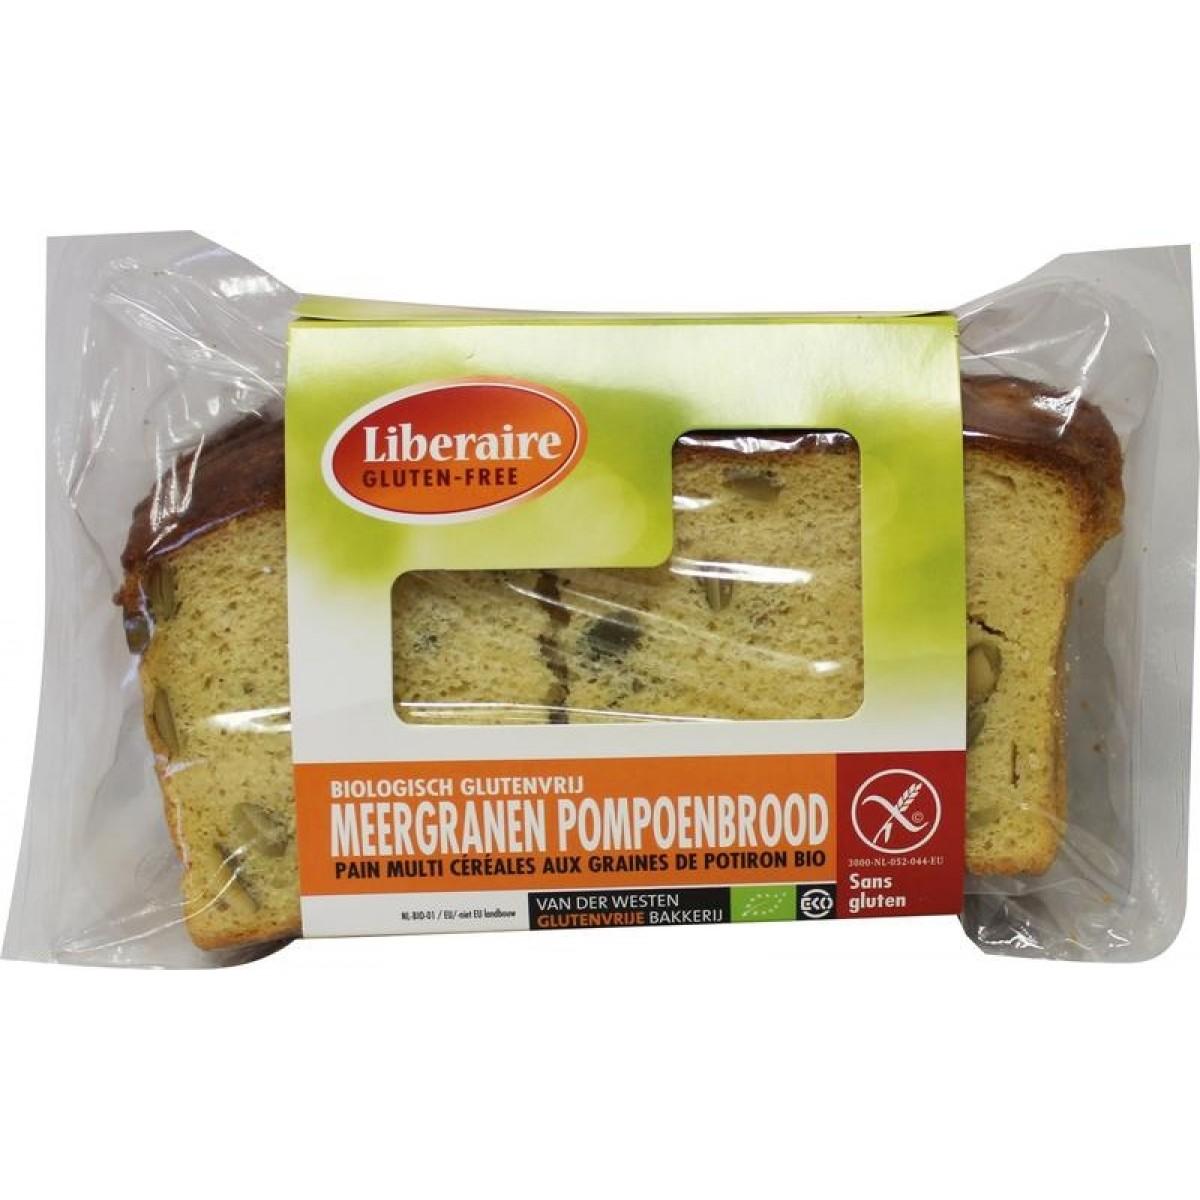 Meergranen Pompoenbrood